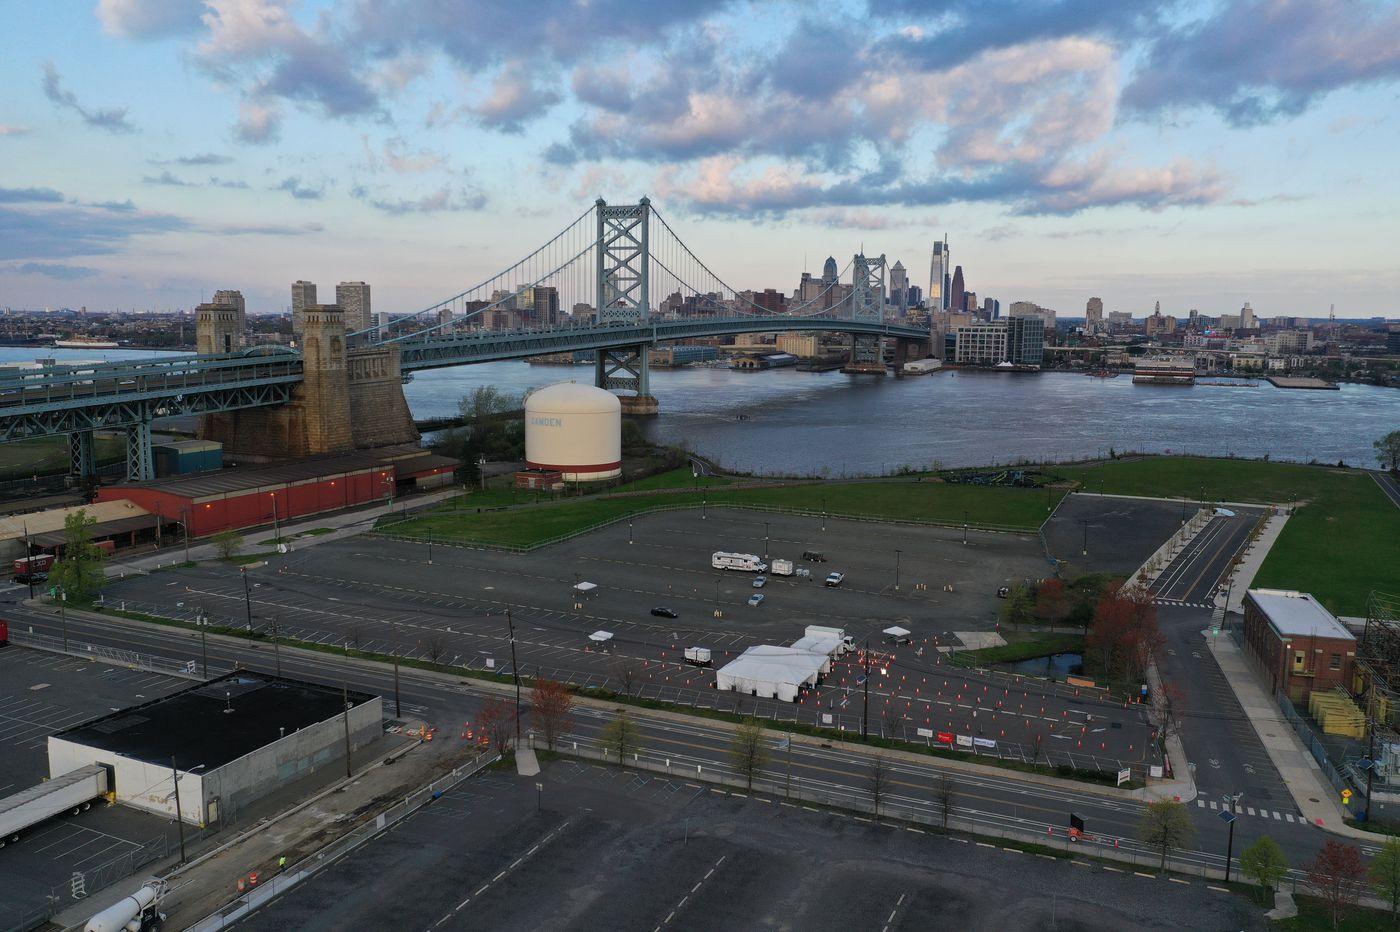 Coronavirus patients pushing some Philadelphia-area hospitals near capacity; N.J. schools to stay closed until May 15